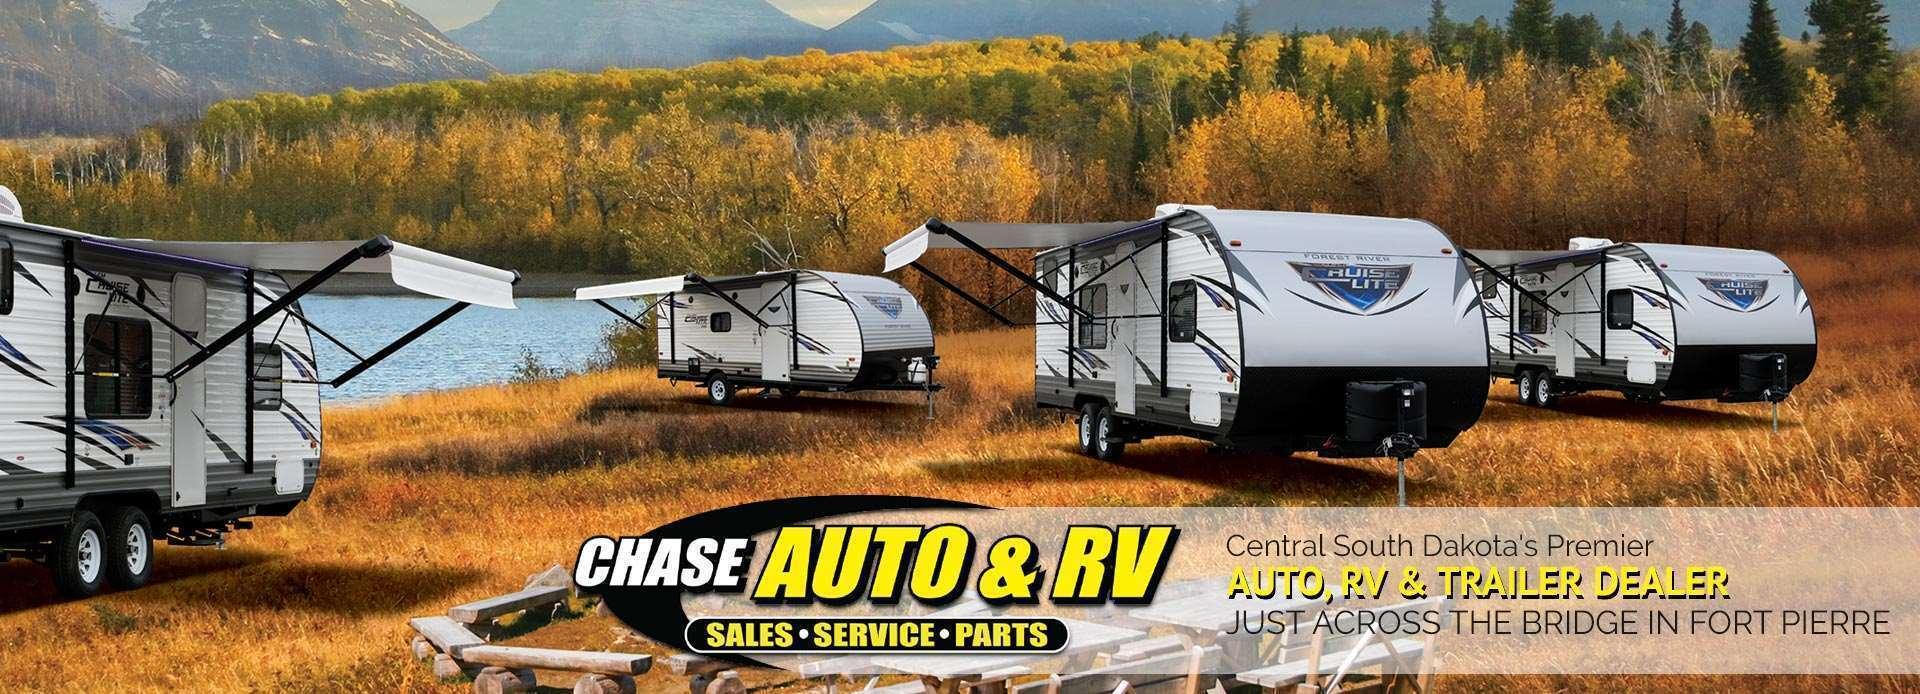 Chase Auto & Rv